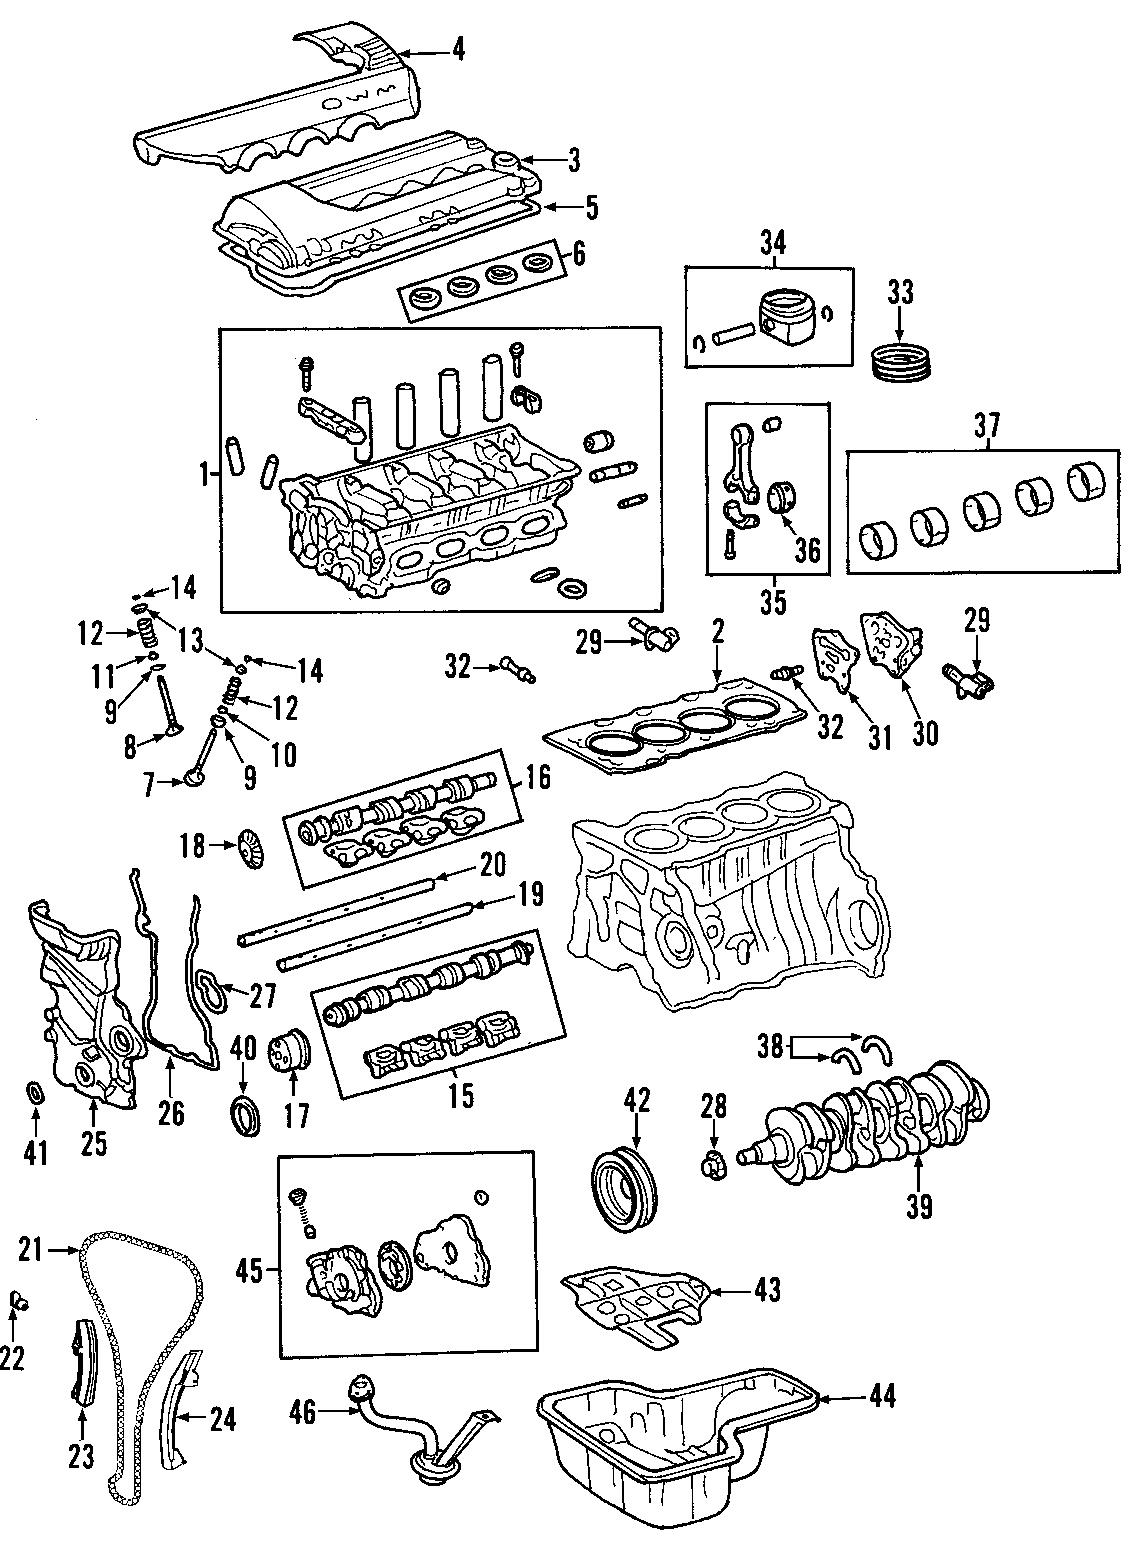 Toyota Corolla Engine Short Block